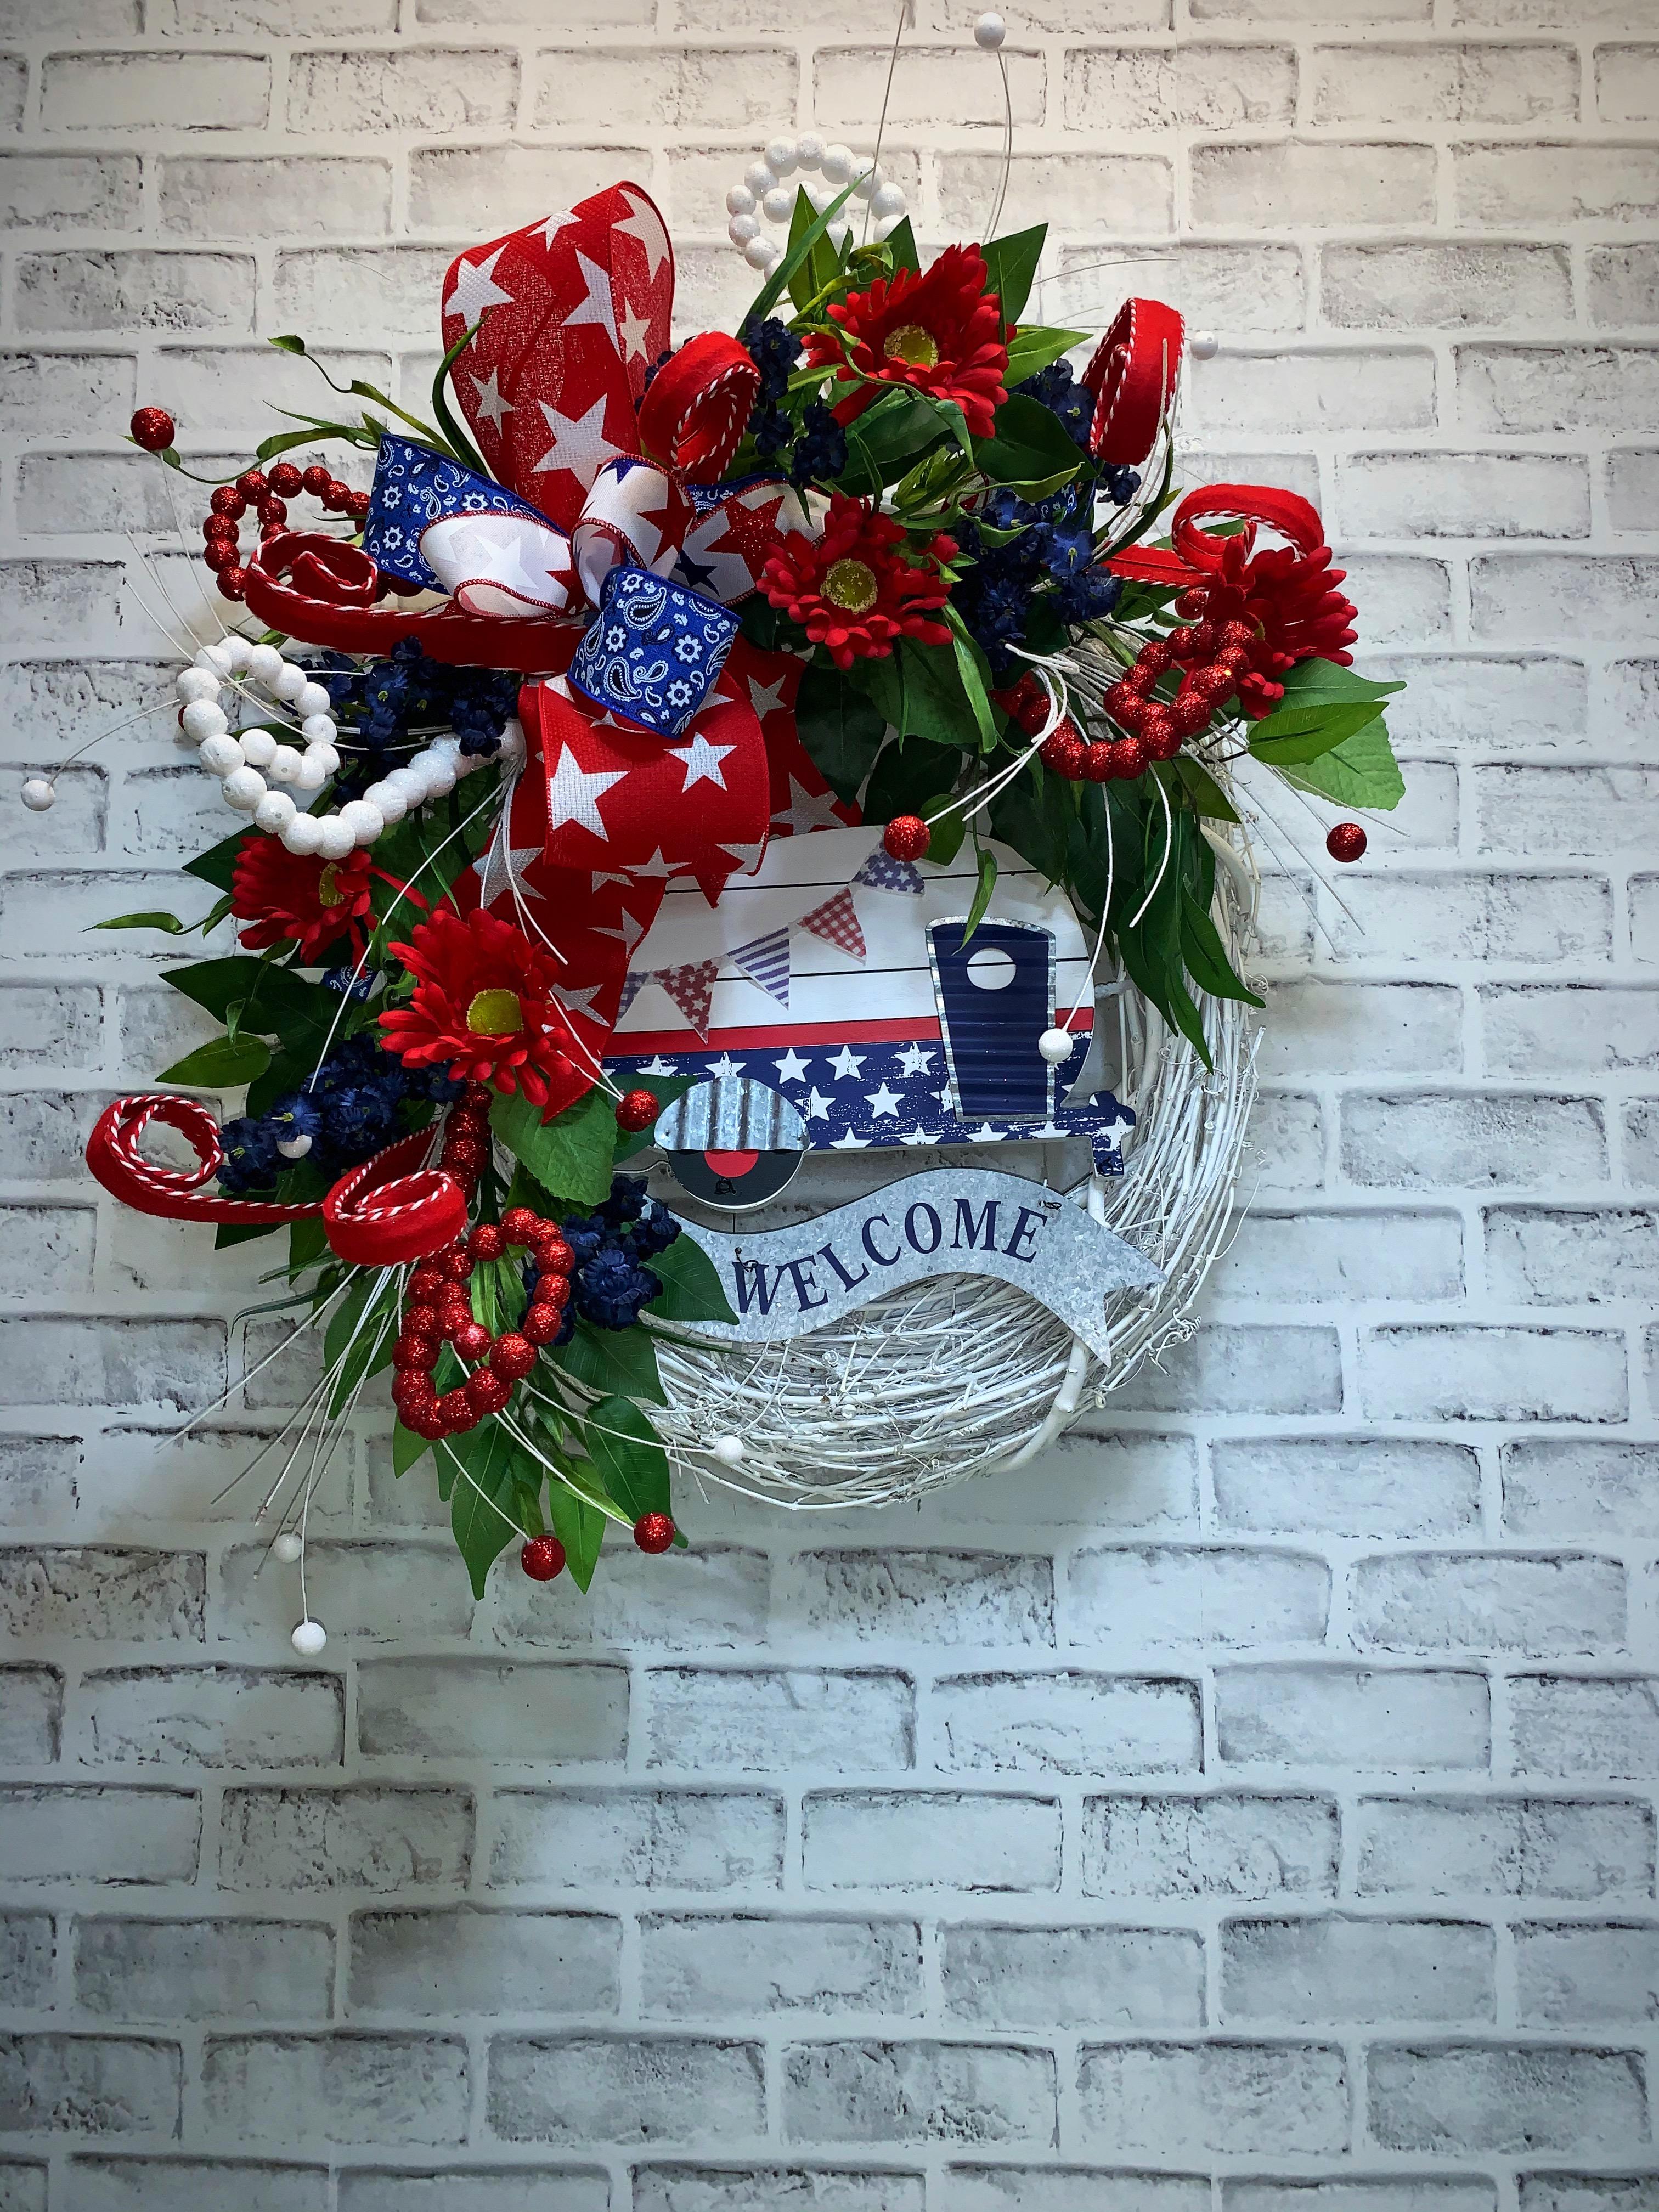 Patriotic Wreath Free Shipping Patriotic Camper Wreath Summer Wreath Summer Camper Red White Blue Patriotic Door Wreath 4th Of July Wreath Summer Decor Home Decor Handmade Wreaths Wreaths For Sale Decorative Wreath